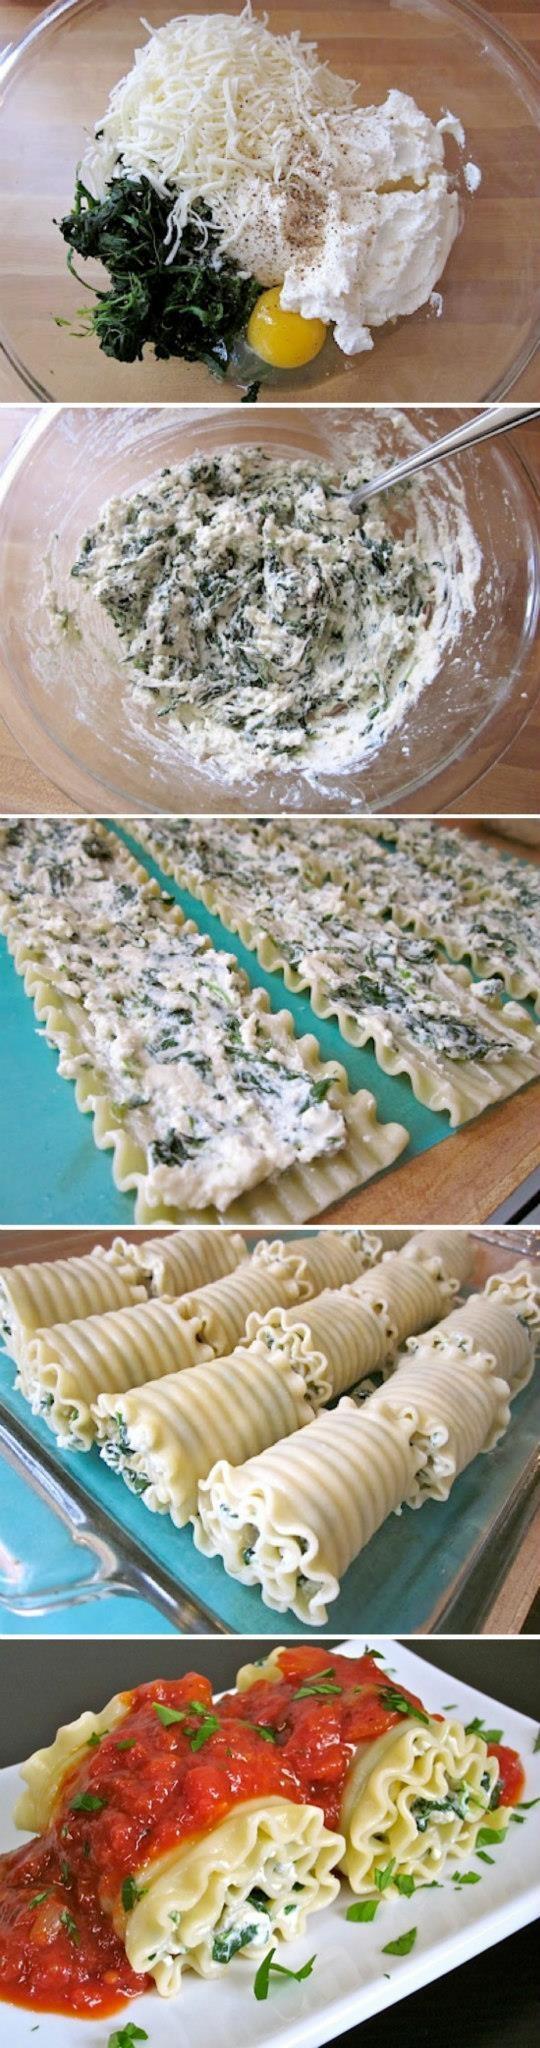 Spinach Lasagna Roll Ups Recipe   1/02/2013